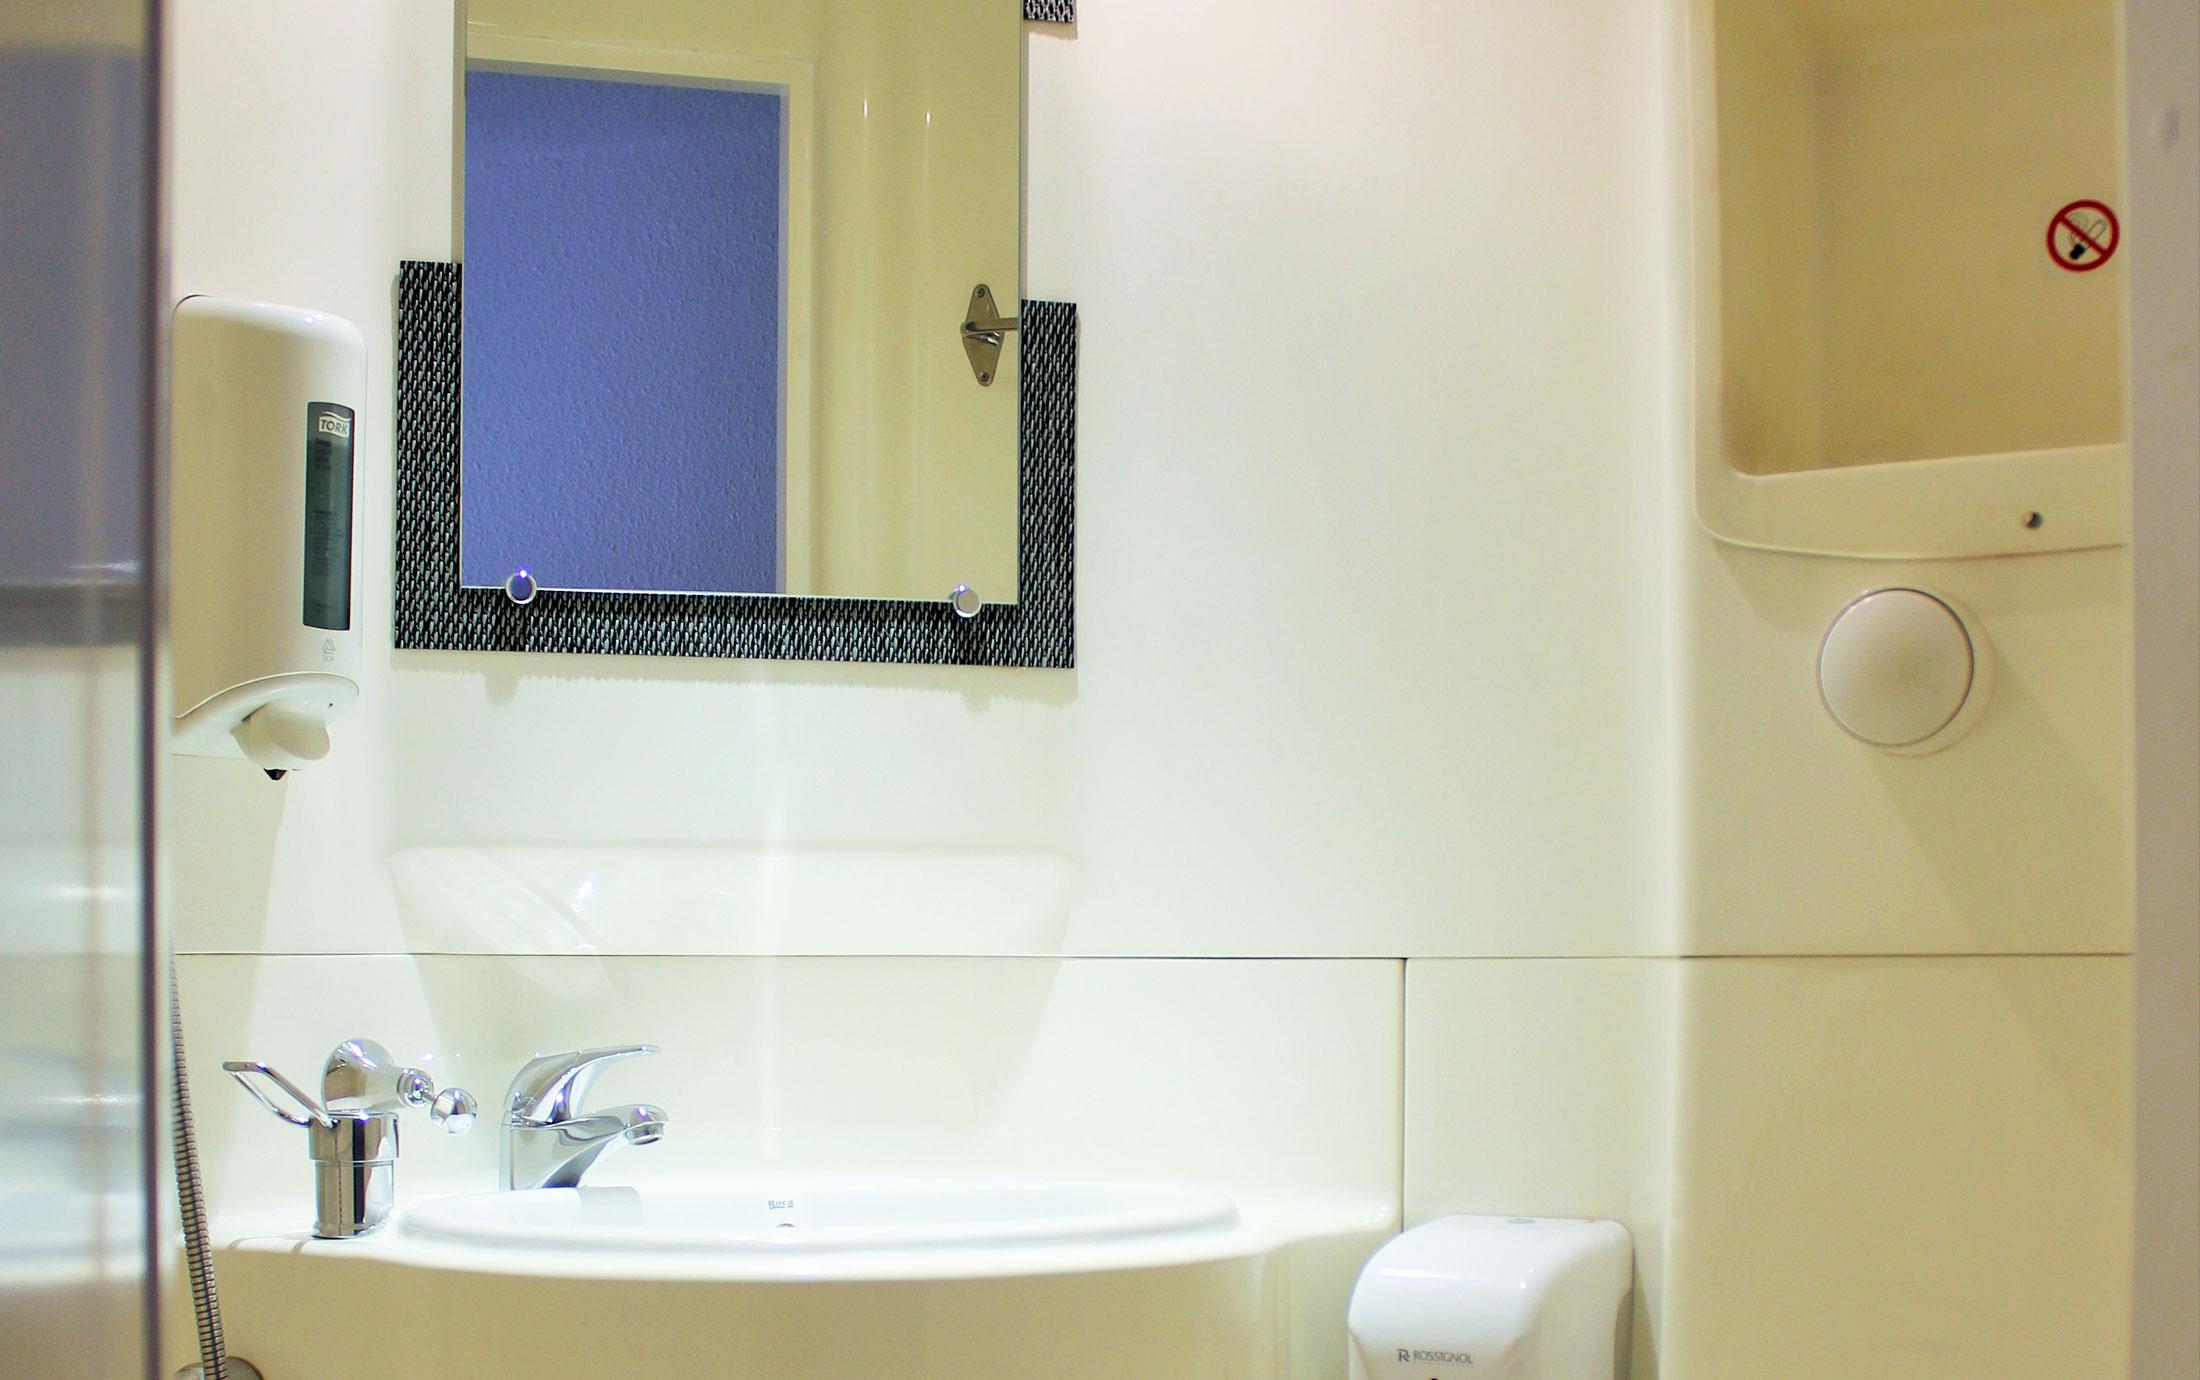 http://www.lidotel.fr/wp-content/uploads/2014/10/salle-de-bain.jpg